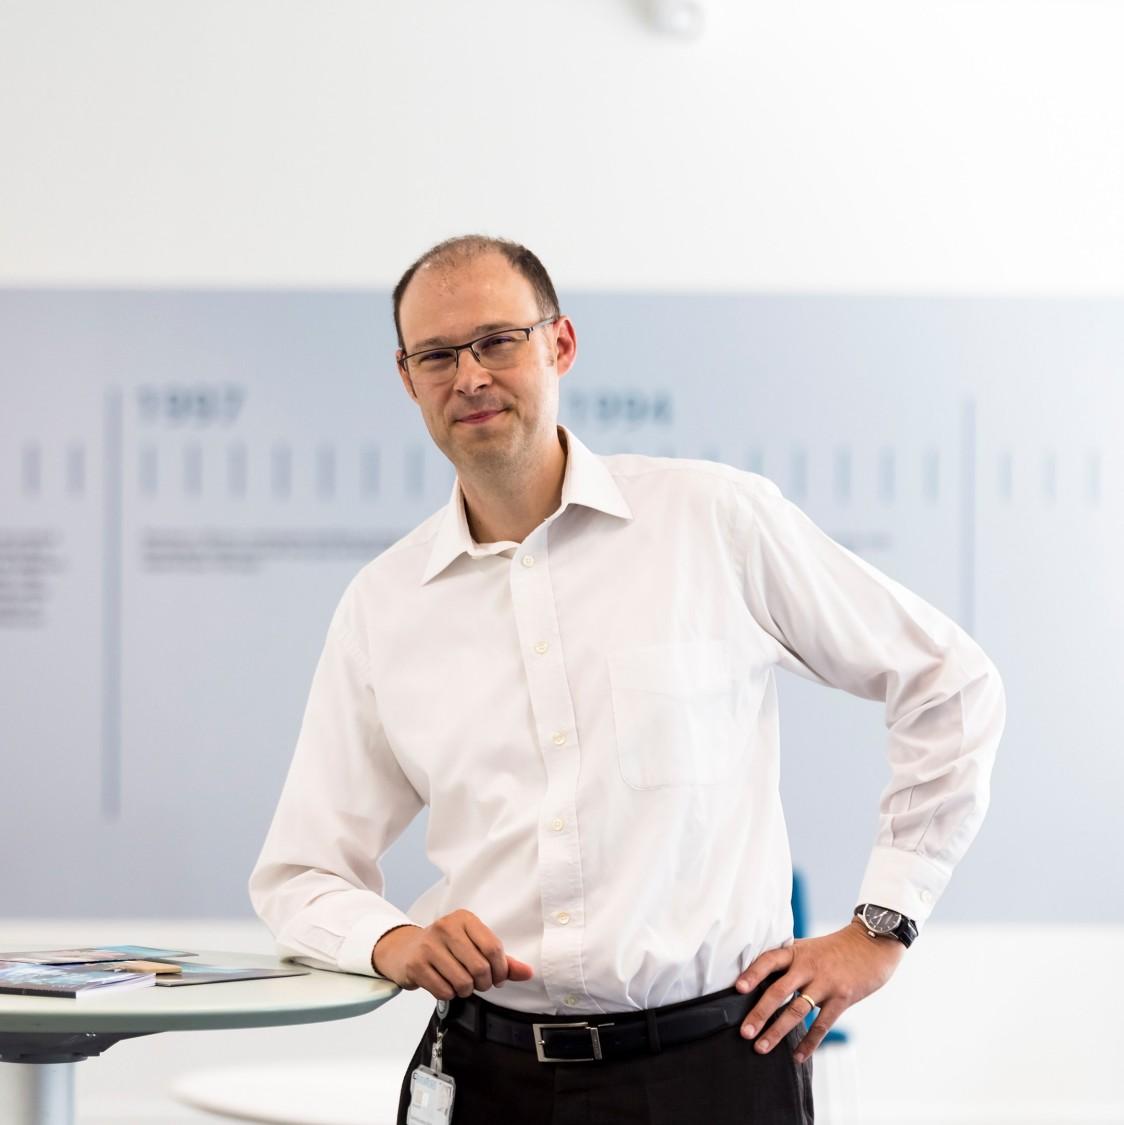 David-Alexandre Gava, Directeur Recrutement France-Belgique